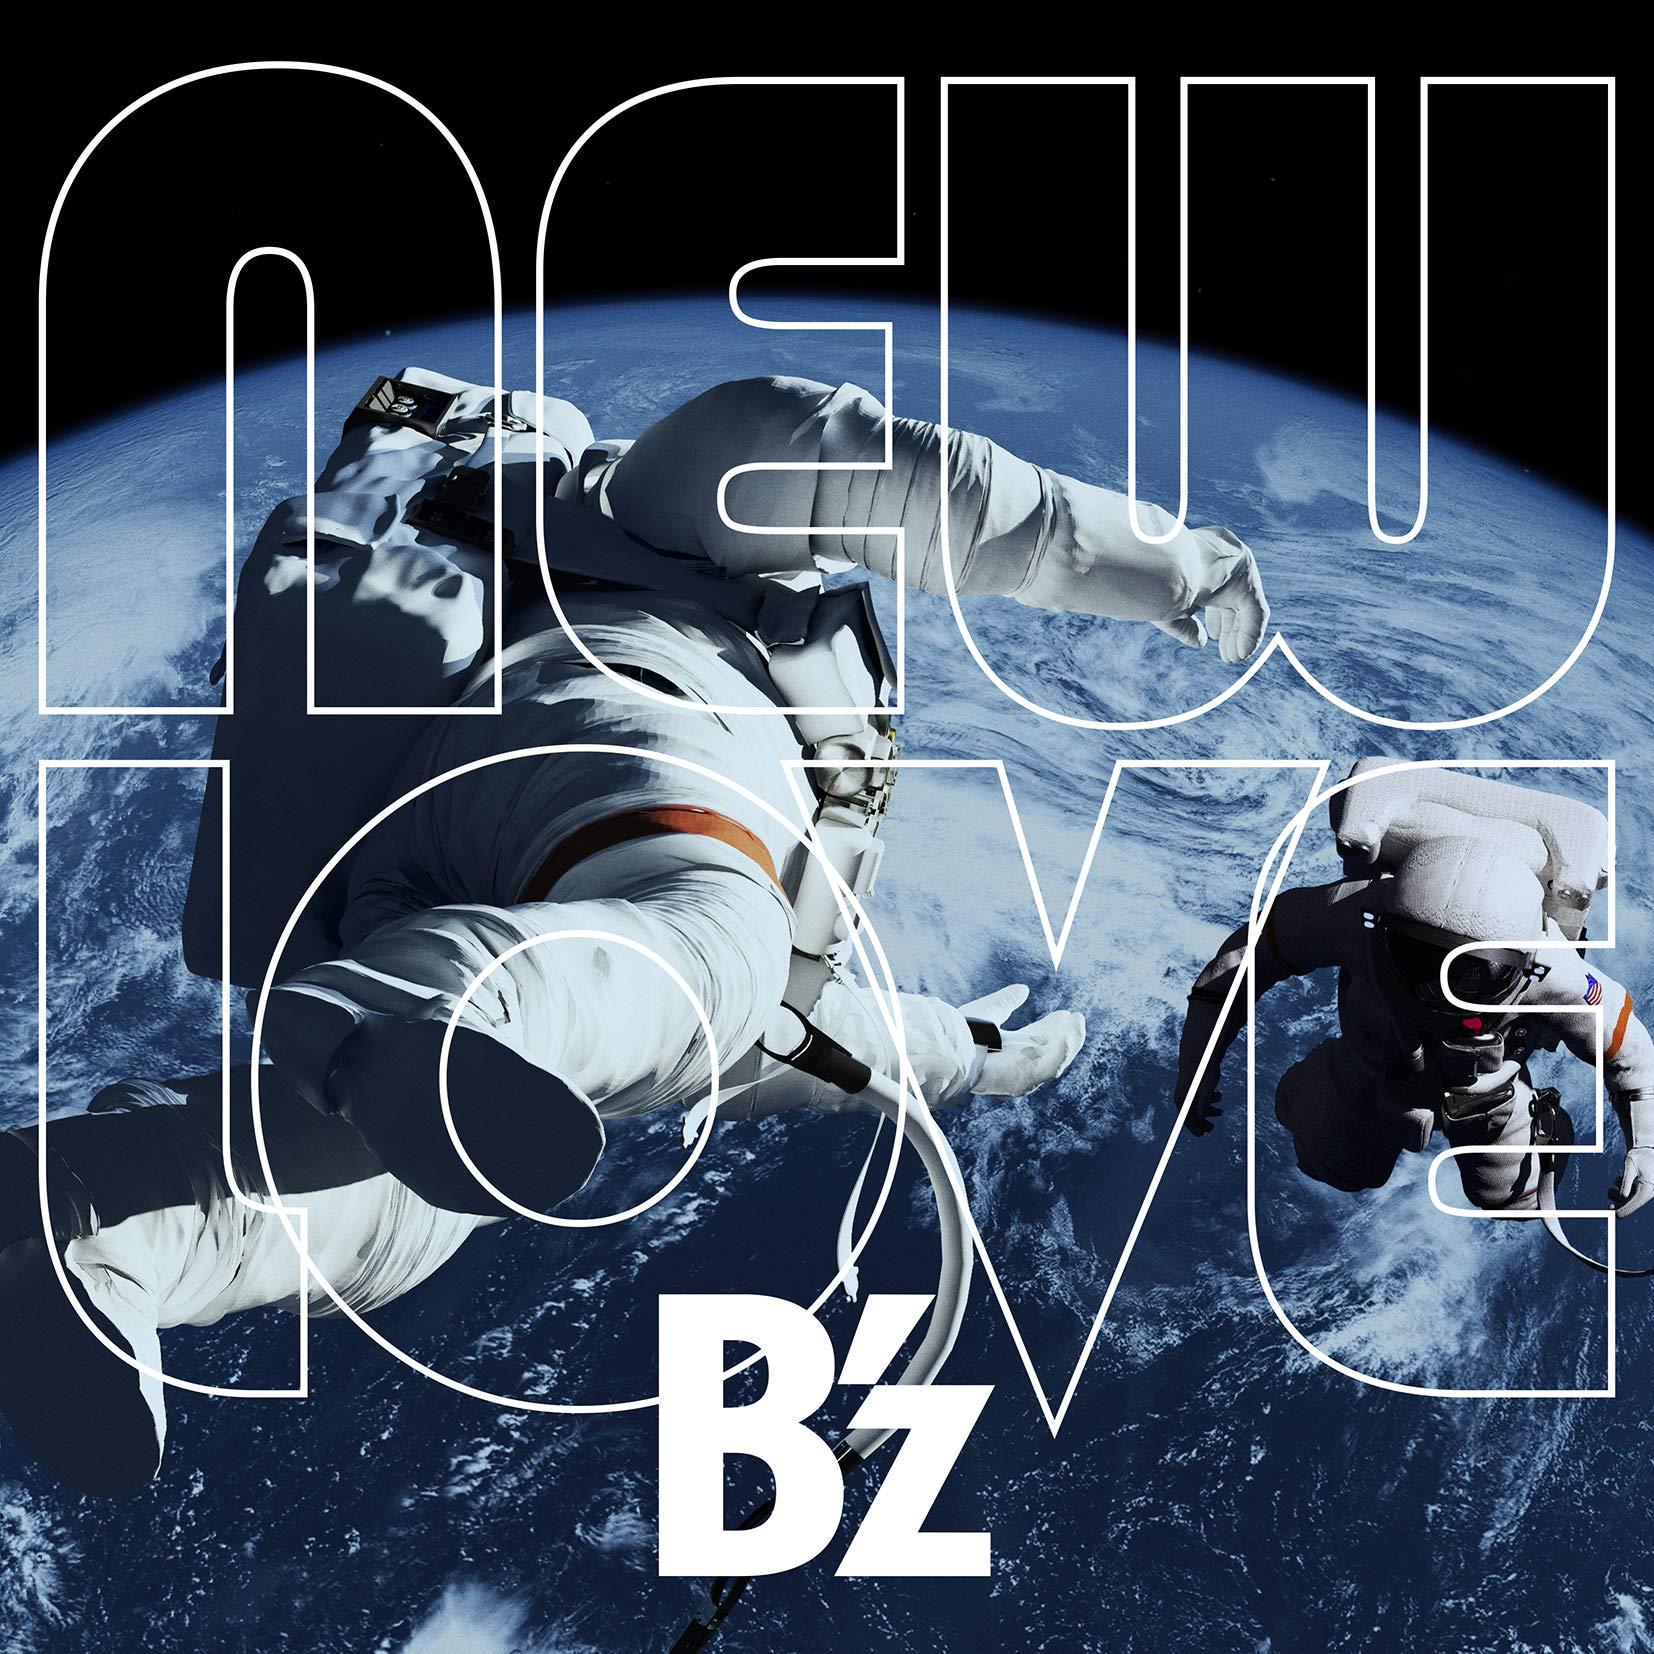 【Amazon.co.jp限定】NEW LOVE (初回生産限定盤) (CD+オリジナルTシャツ) (特典: オリジナルクリアチケットホルダー)